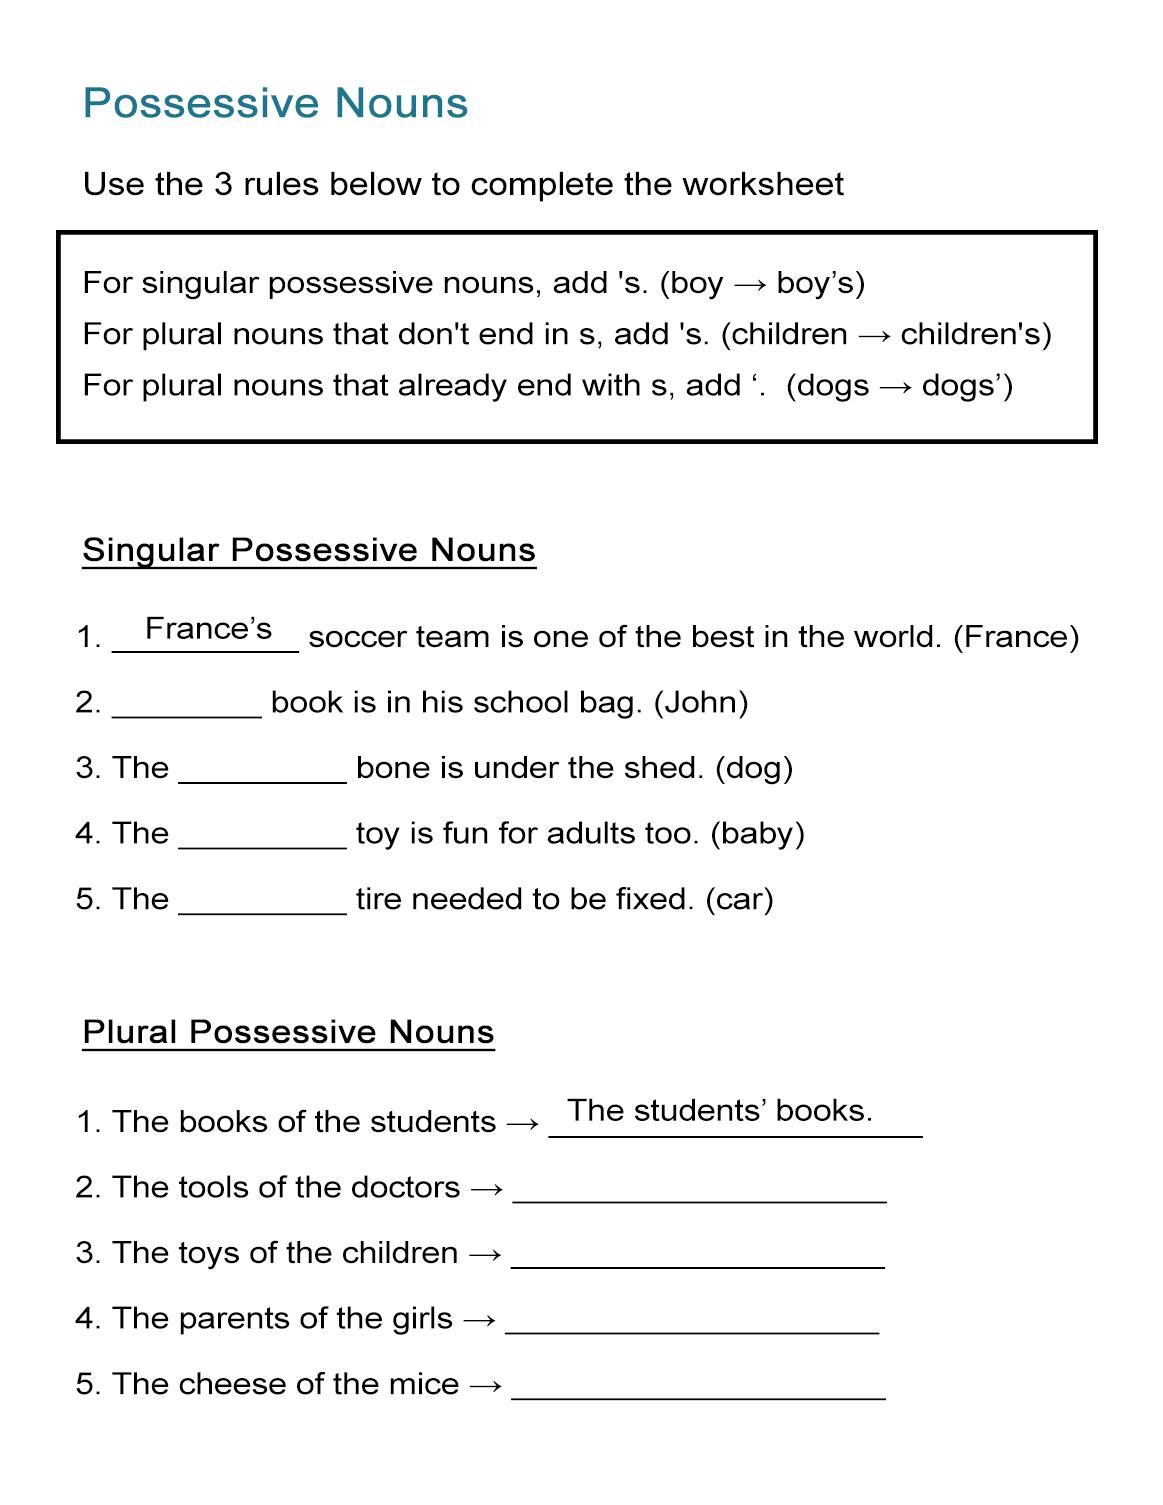 Free Printable Possessive Nouns Worksheets